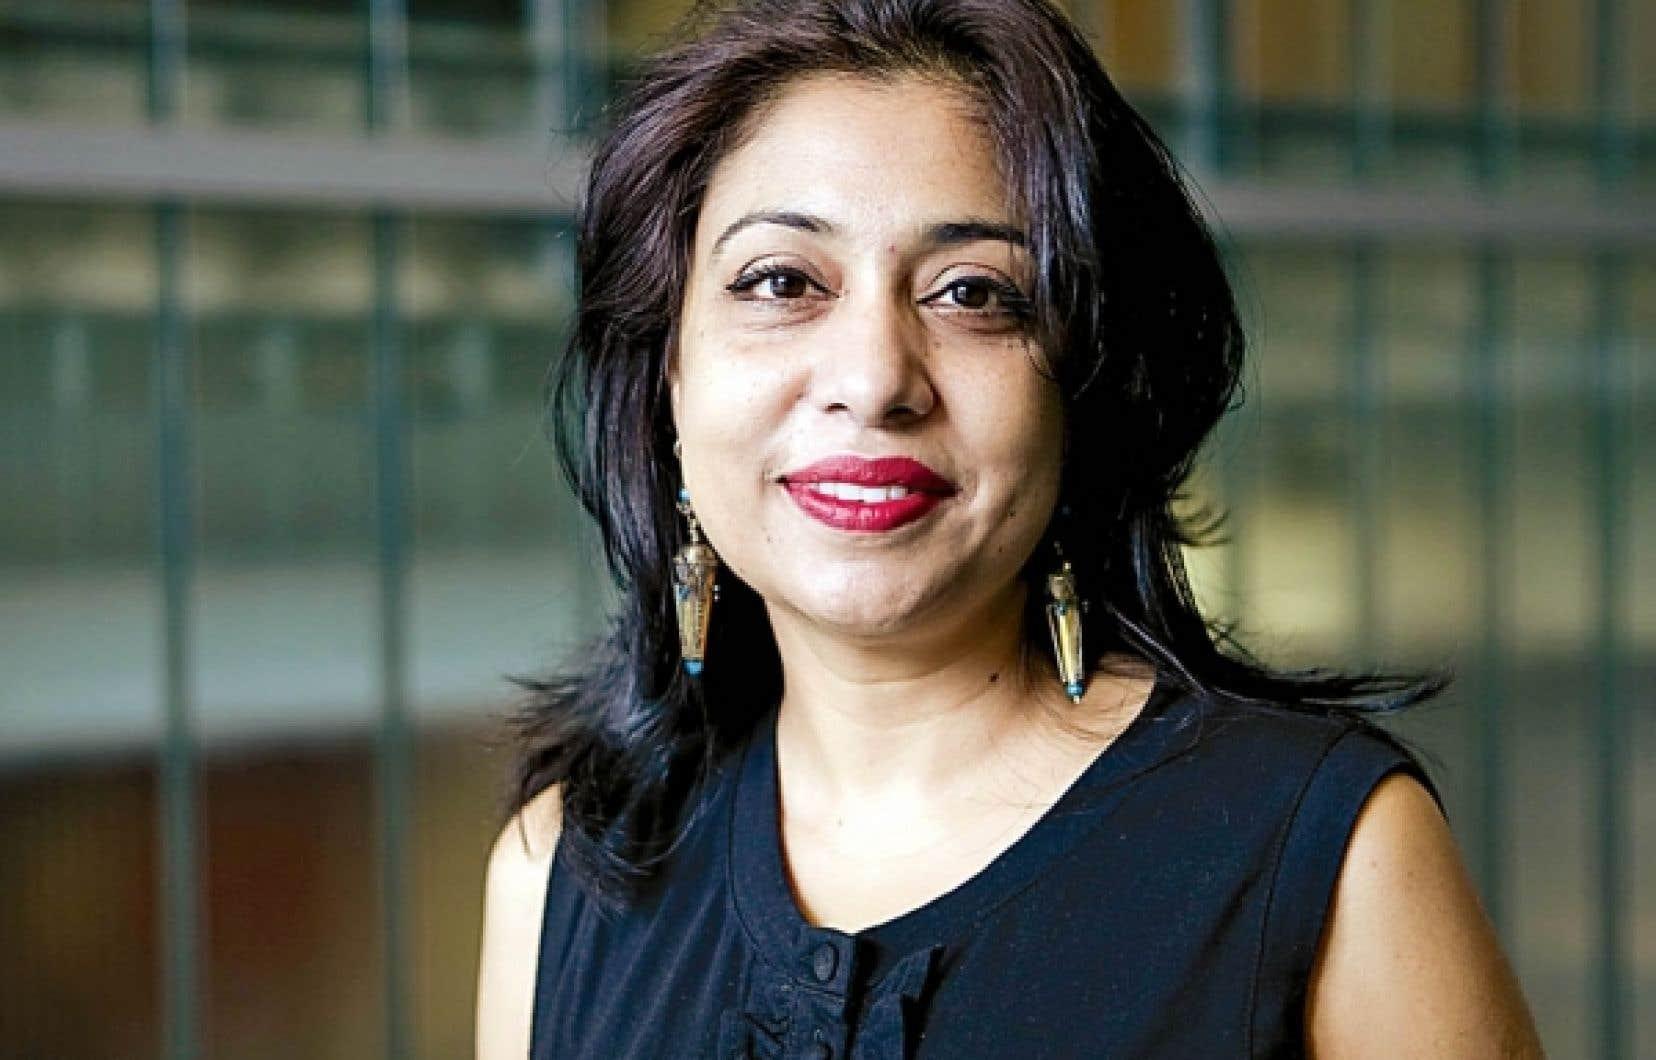 La professeure Adeela Arshad-Ayaz, théoricienne critique du postcolonialisme<br />